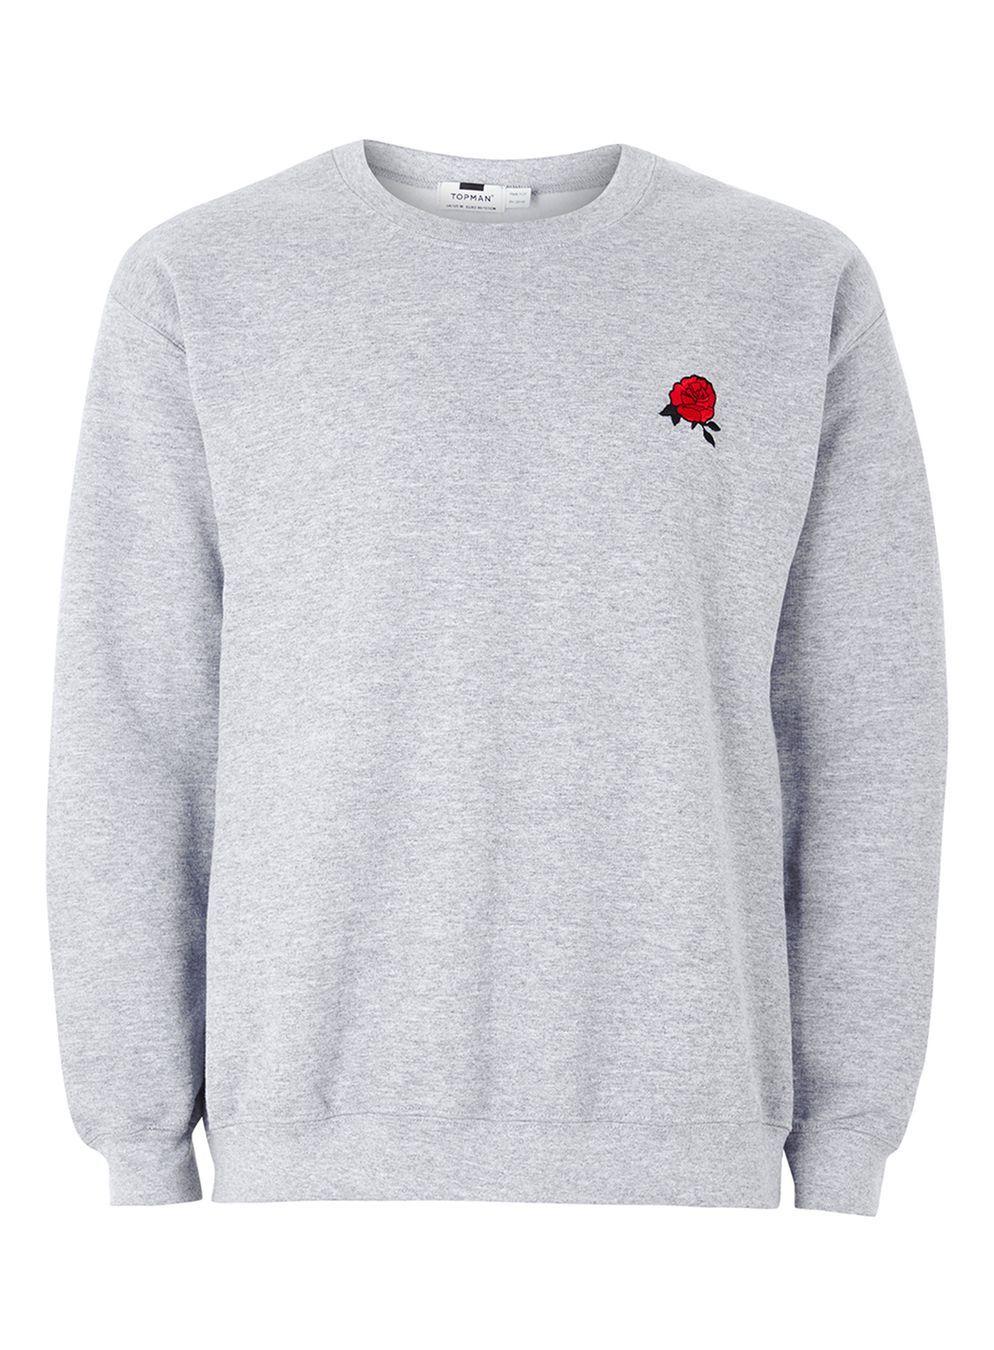 38a307e861e40d Grey Rose Embroidered Sweatshirt Herren Sweatshirt, Grey Sweatshirt, Crew  Neck Sweatshirt, Herren Style